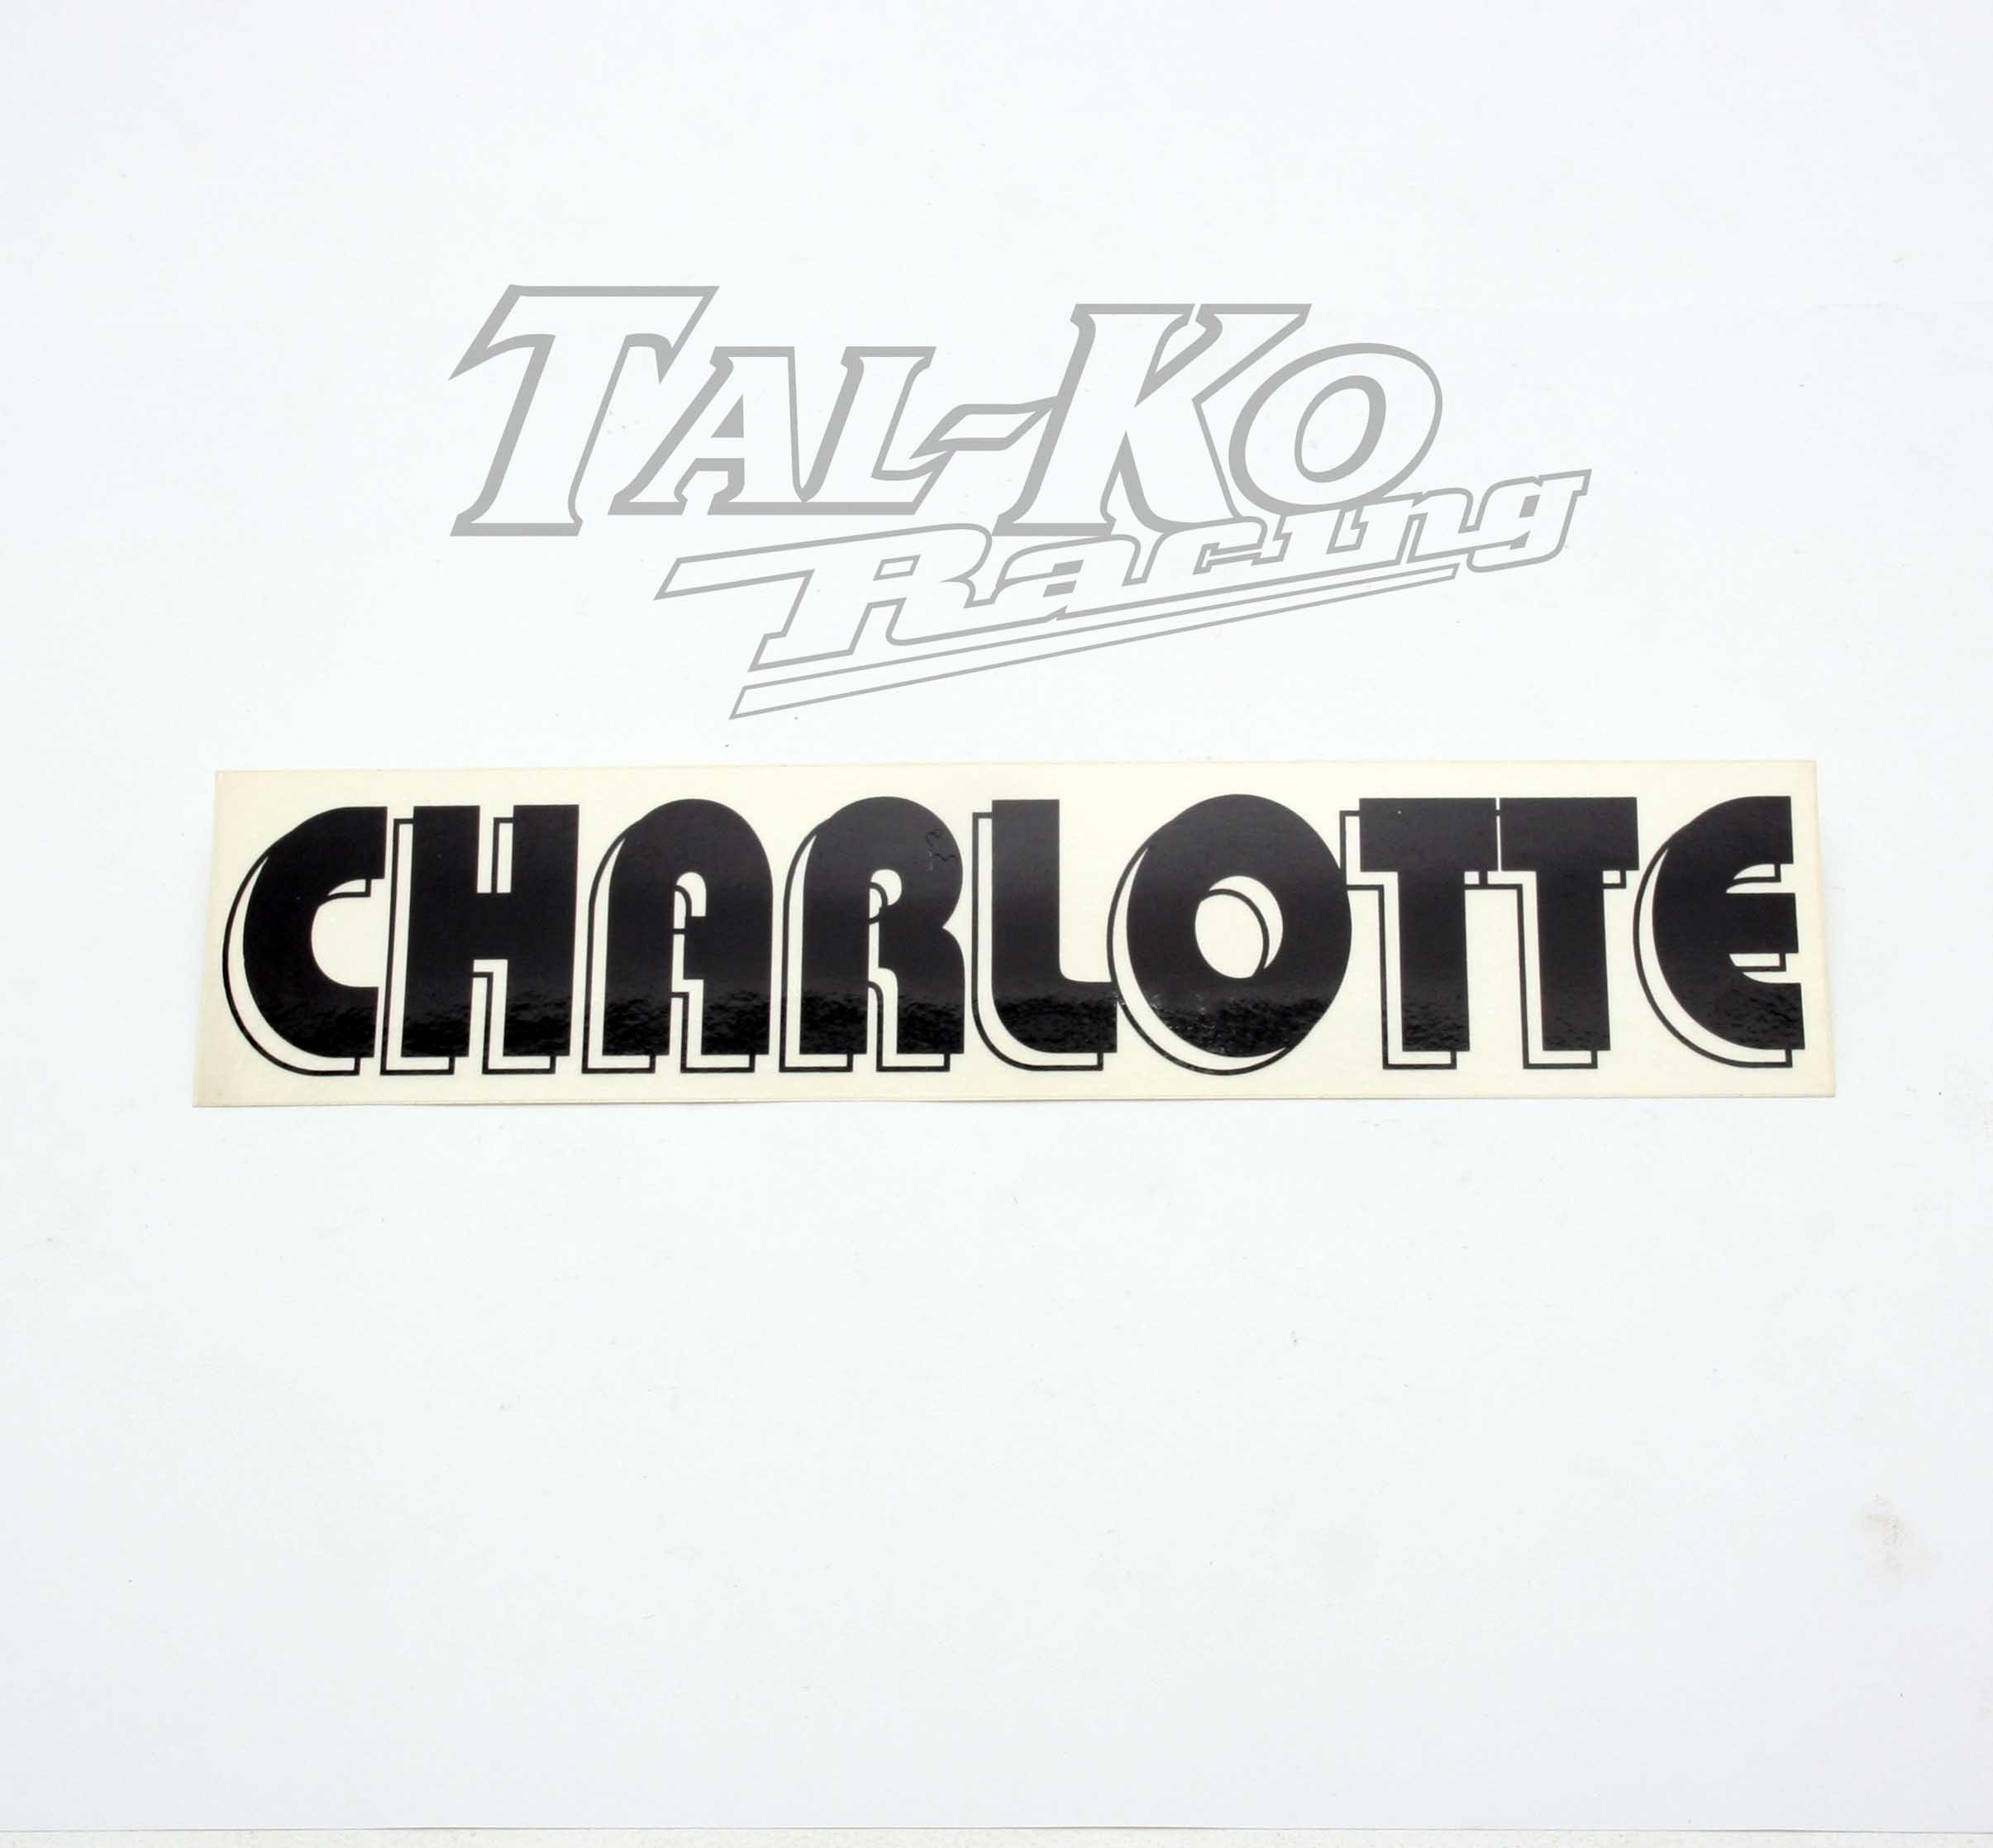 CRG CHARLOTTE STICKER DECAL 250 x 55